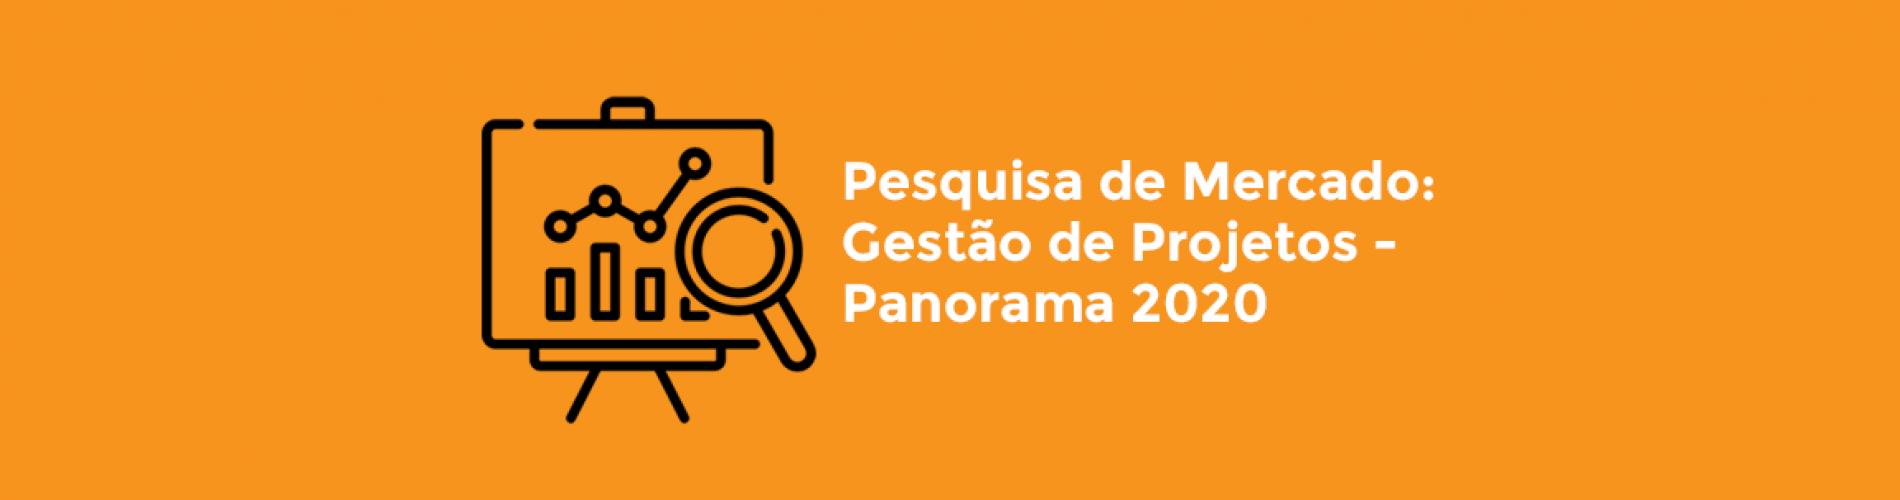 pesquisa-de-mercado-gestao-de-projetos-panorama-2020